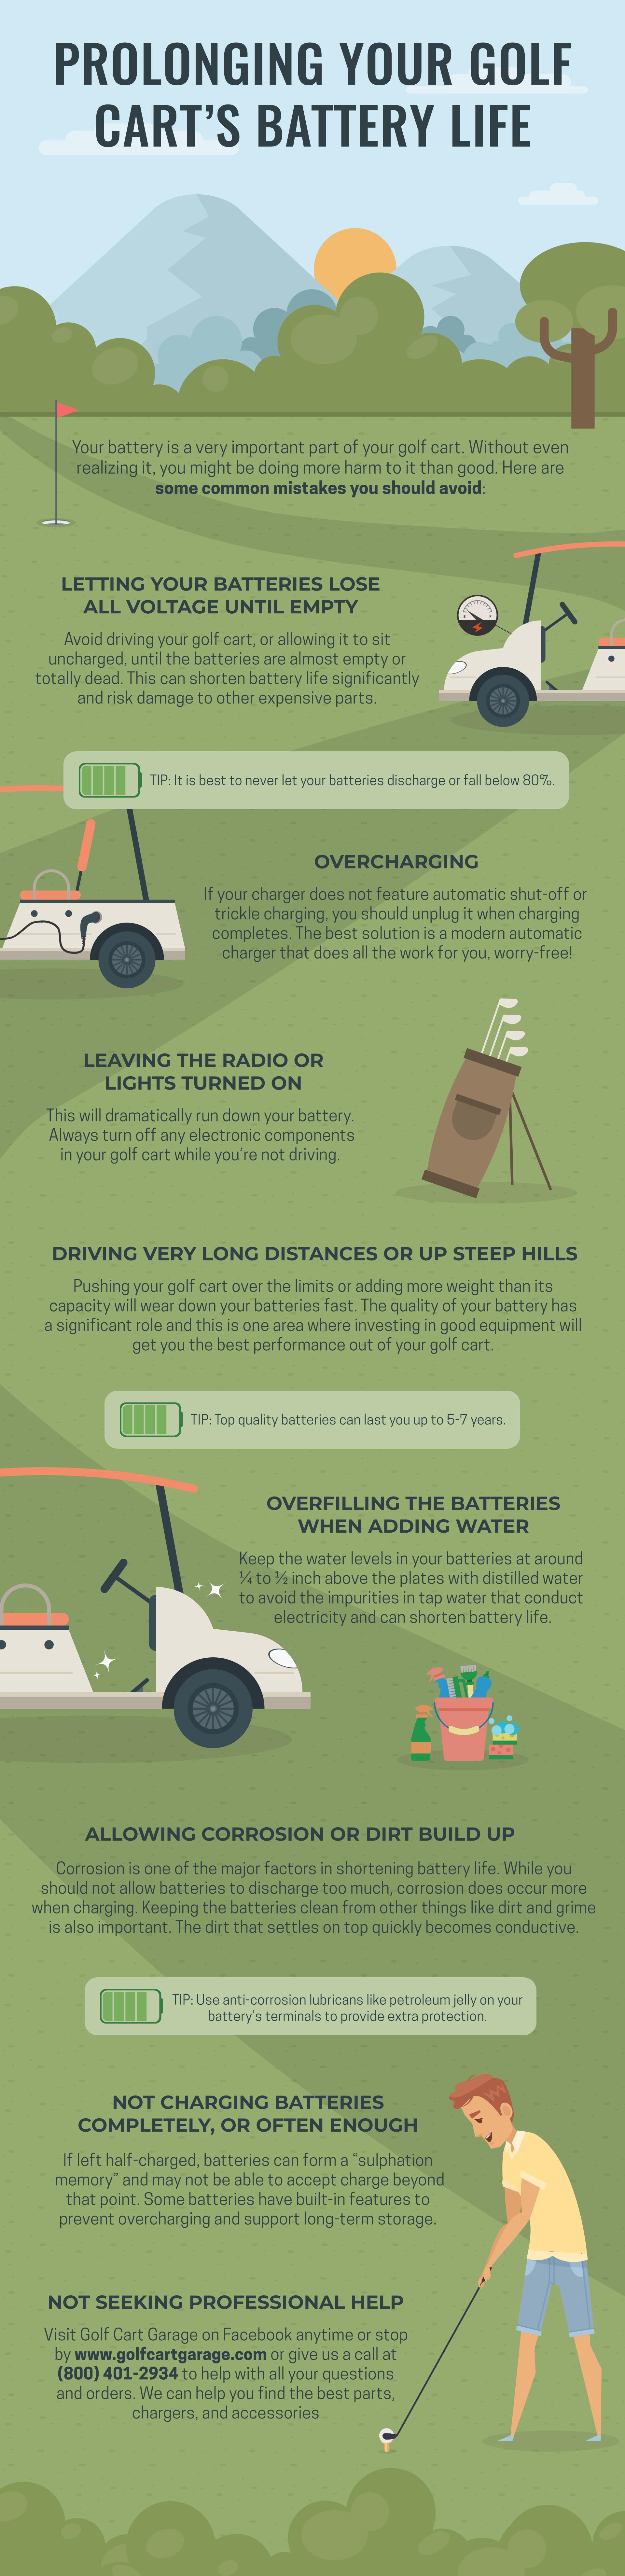 golf-cart-garage-infographic-002.jpg